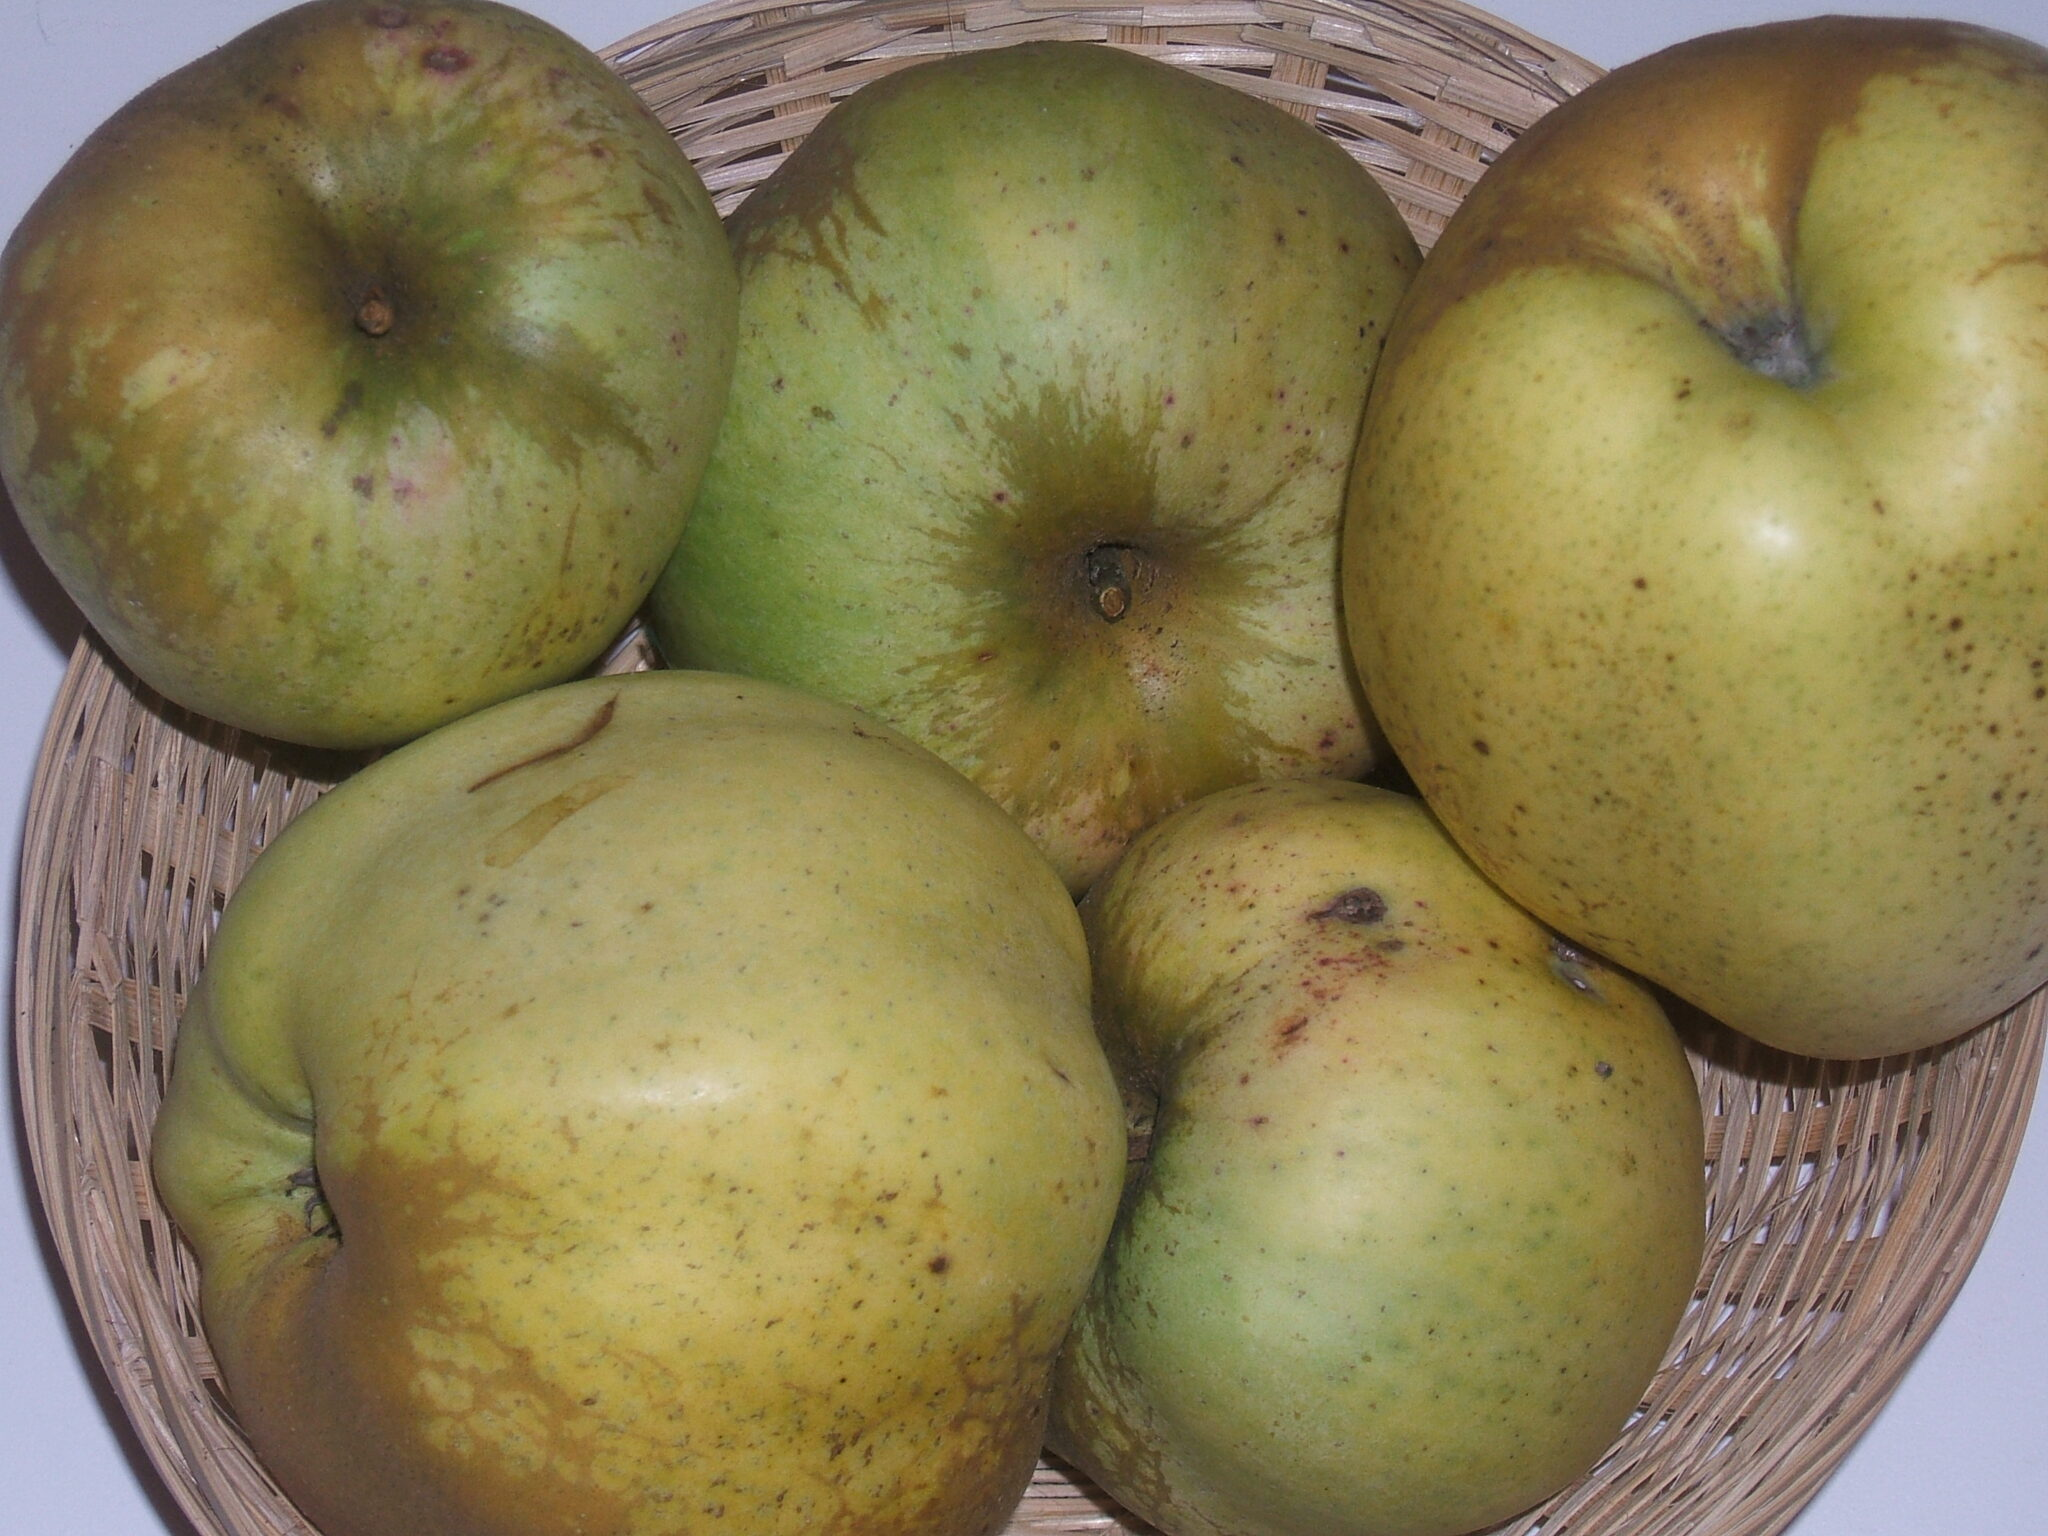 Calville du Roi (fruit).